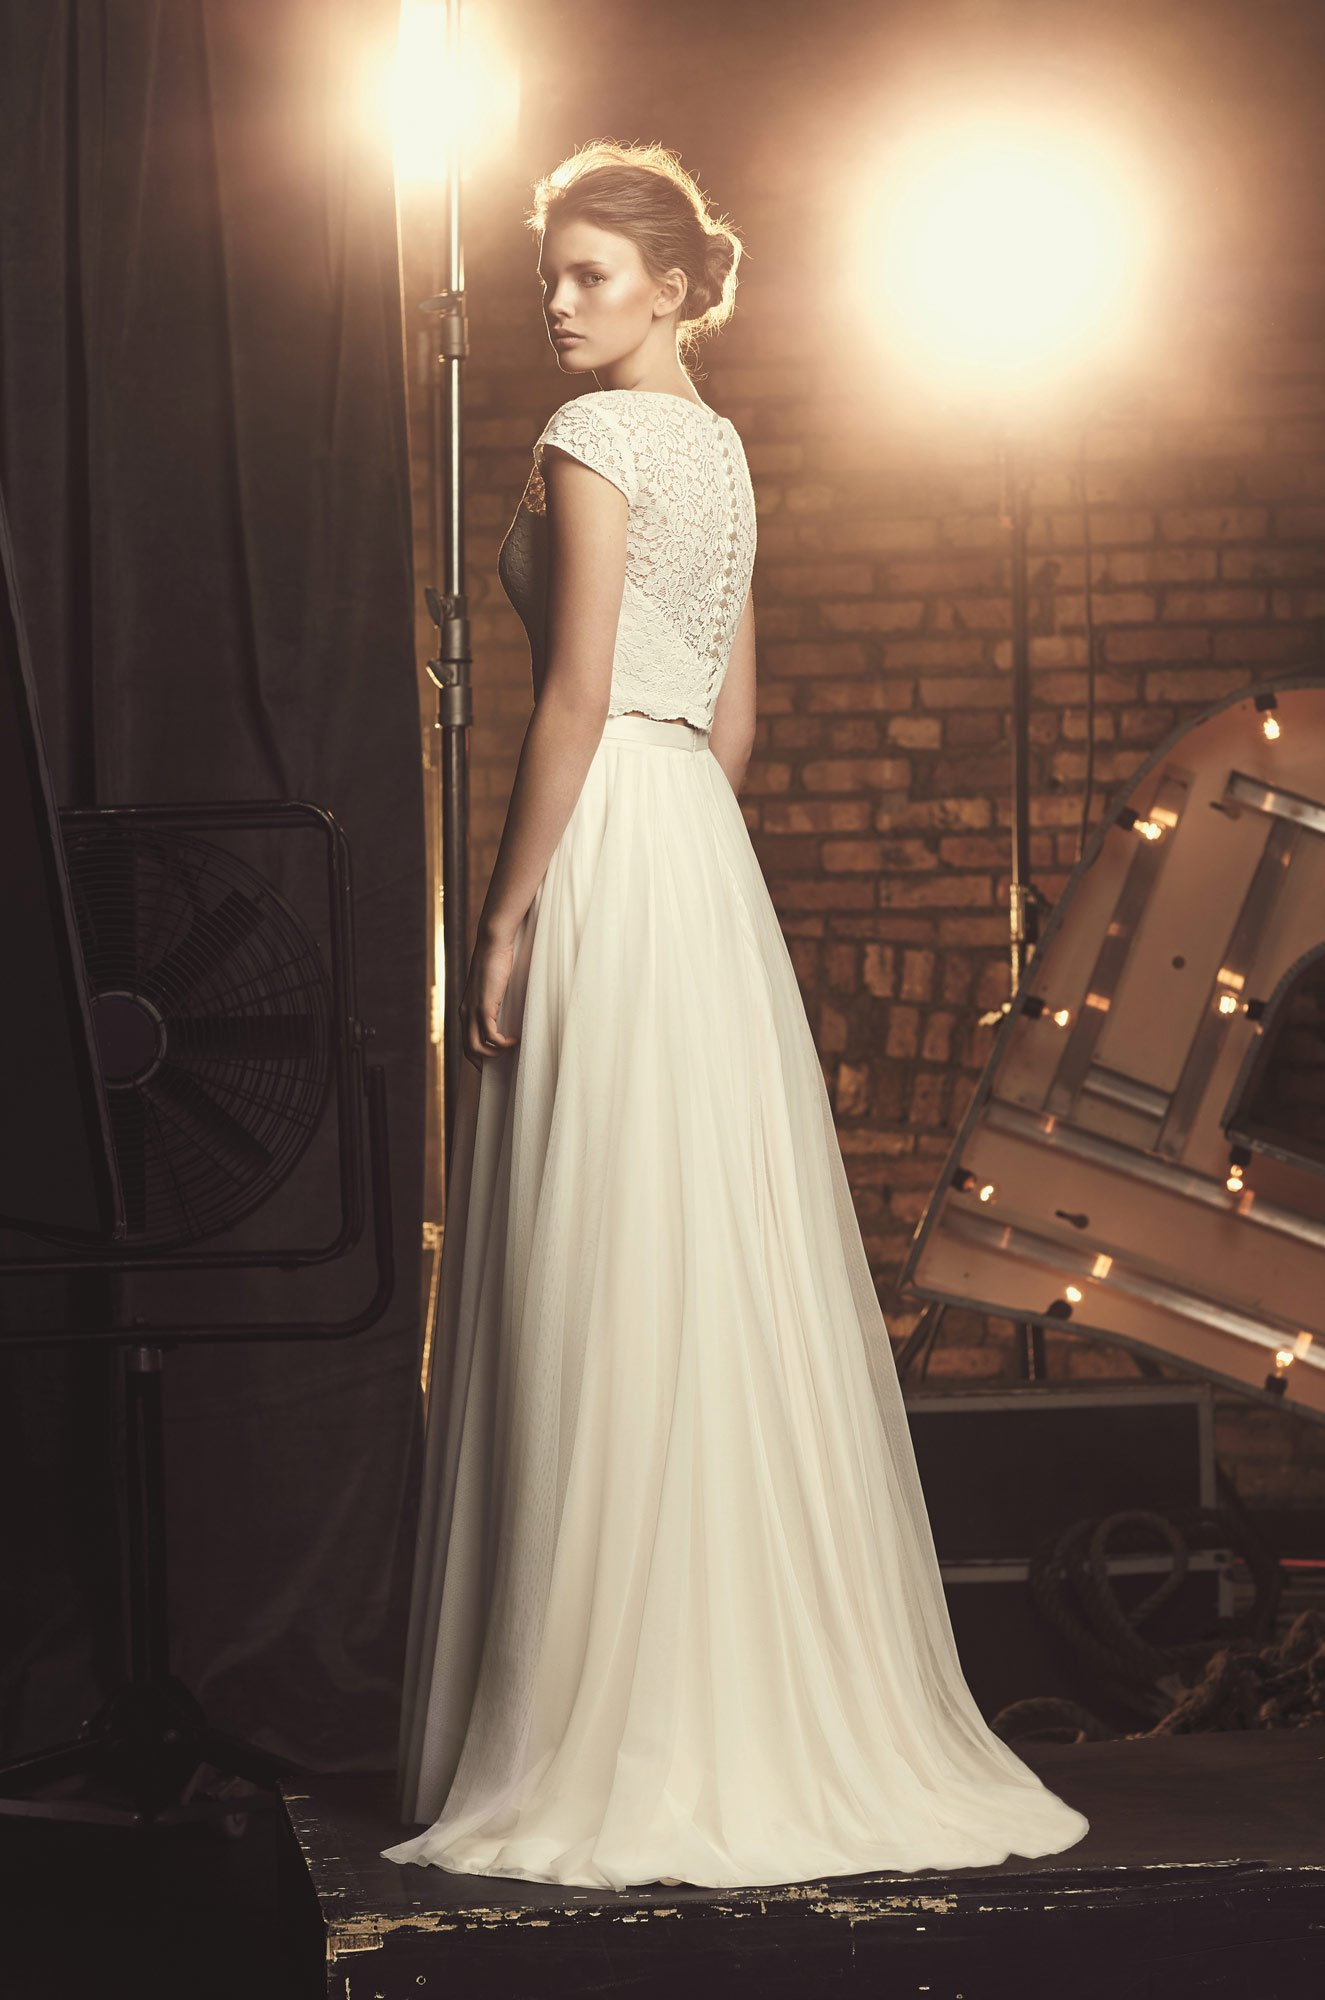 Bitsy Bridal Utah Modern Details On Classic Silhouettes